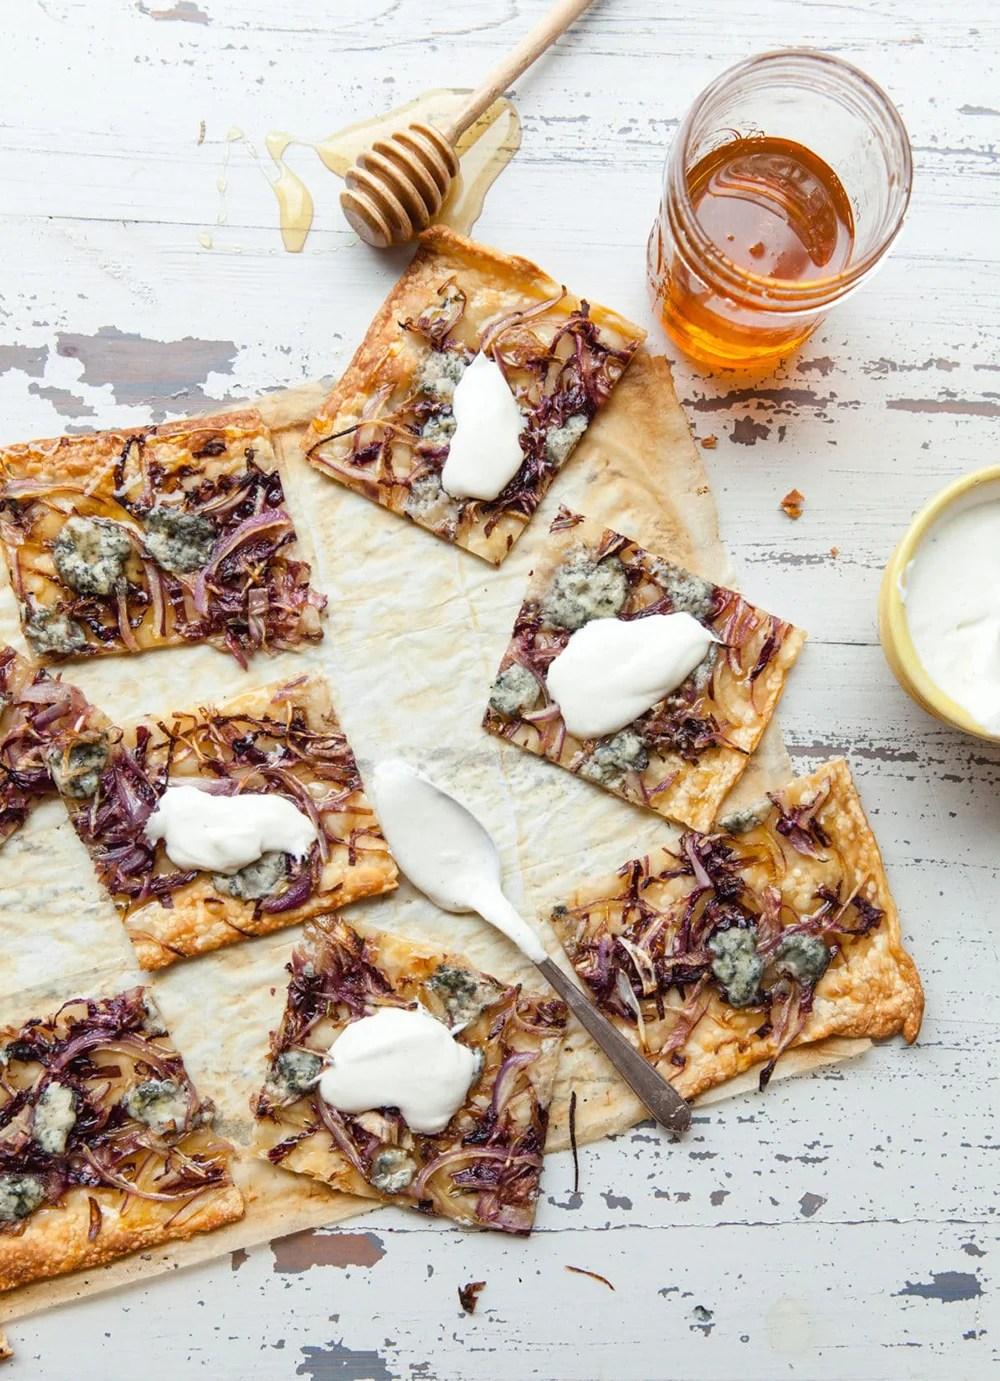 12 domaćih recepata za pizzu i somun koji možete isprobati - roomfortuesday.com